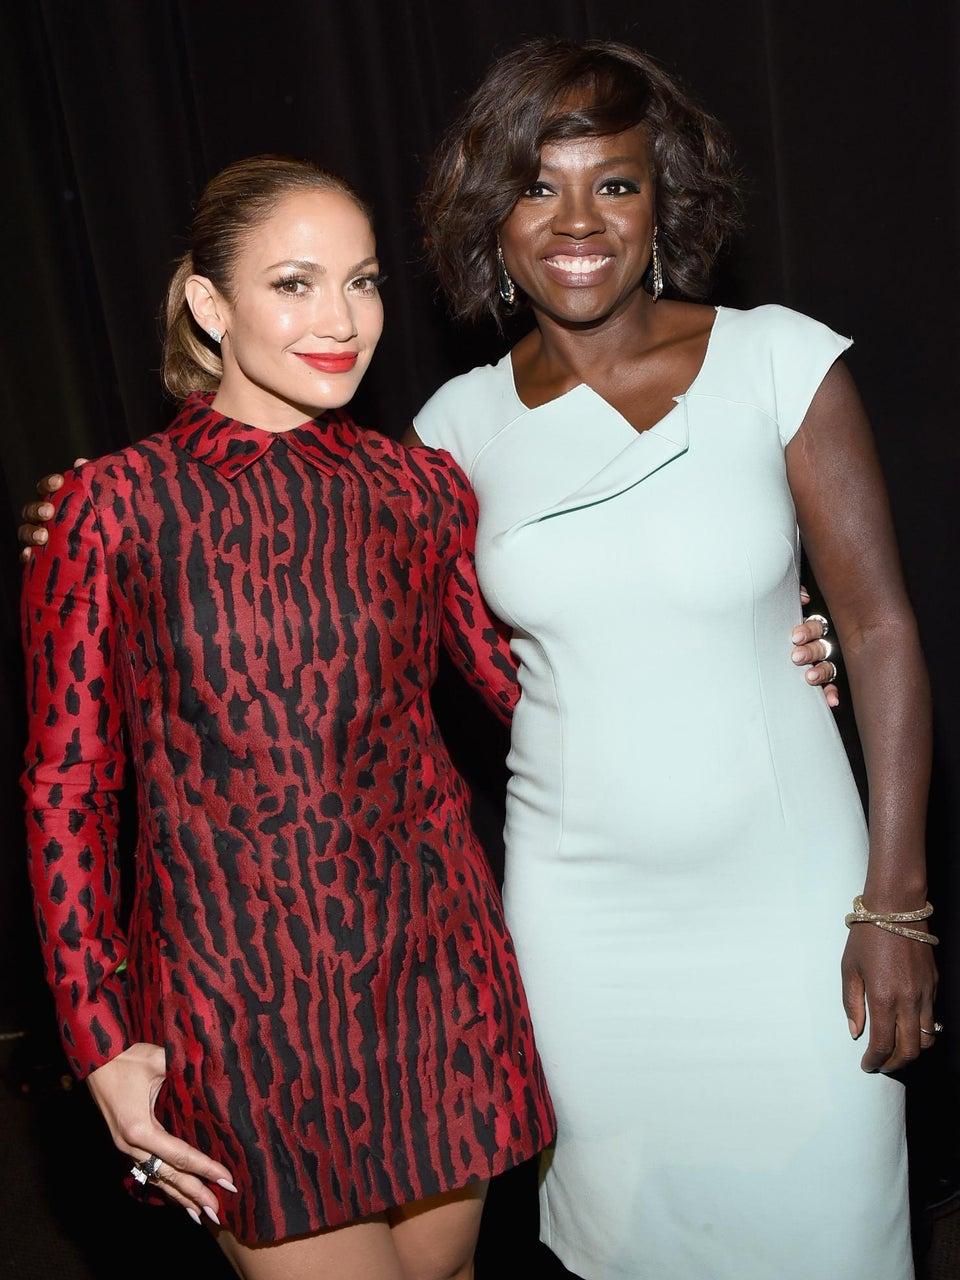 EXCLUSIVE Clip: Viola Davis Seeks Revenge for Son's Murder in 'Lila and Eve,' Co-Starring Jennifer Lopez